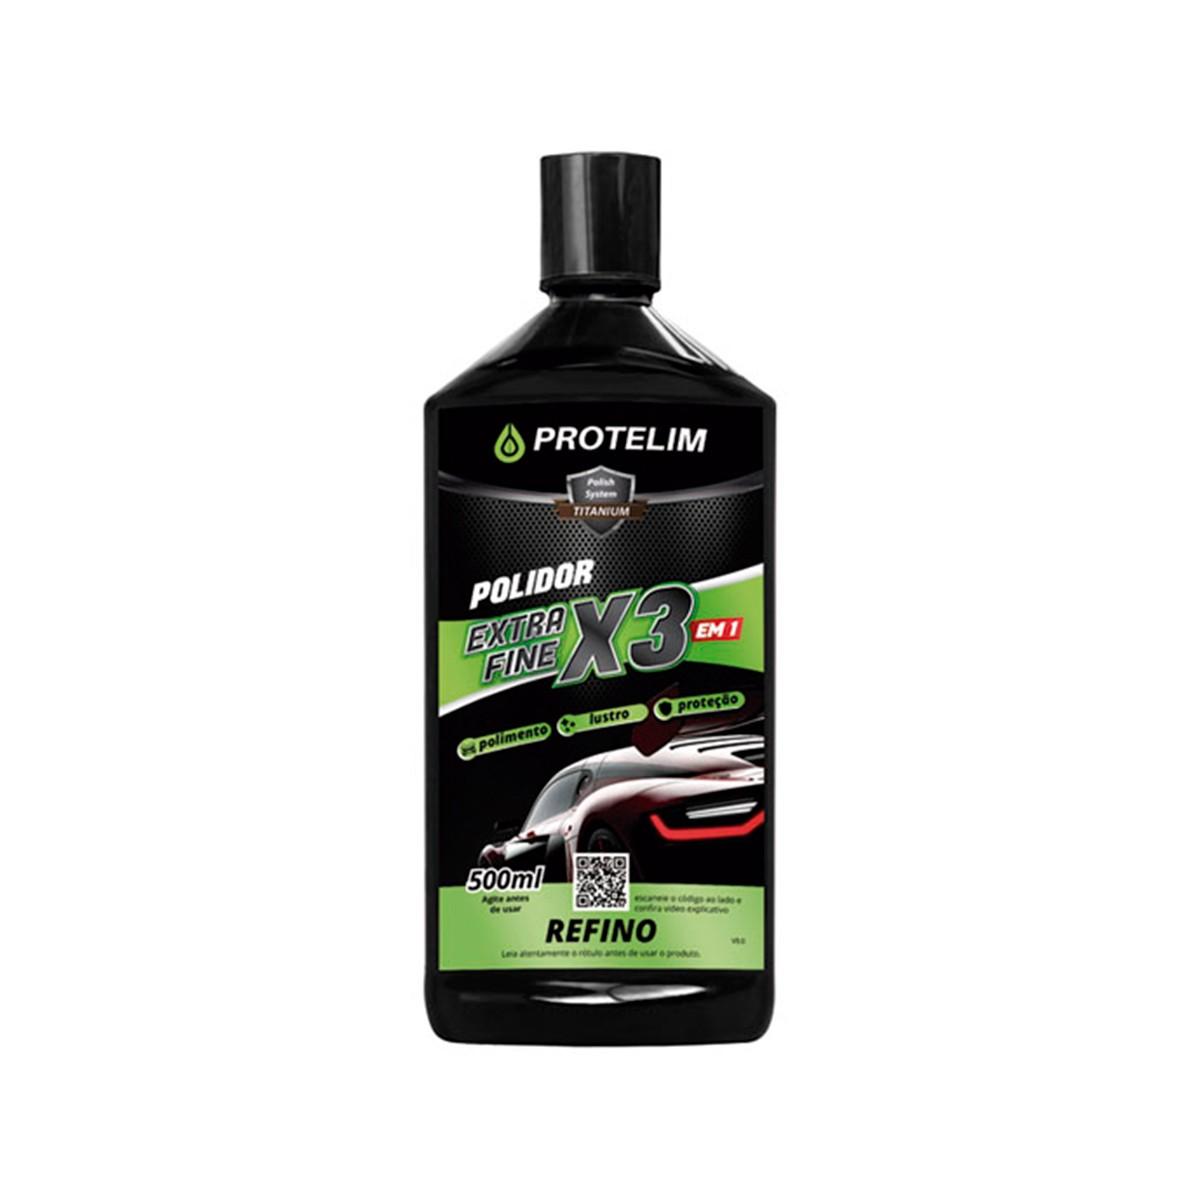 Polidor 3X1 Extra Fine X3 - Protelim